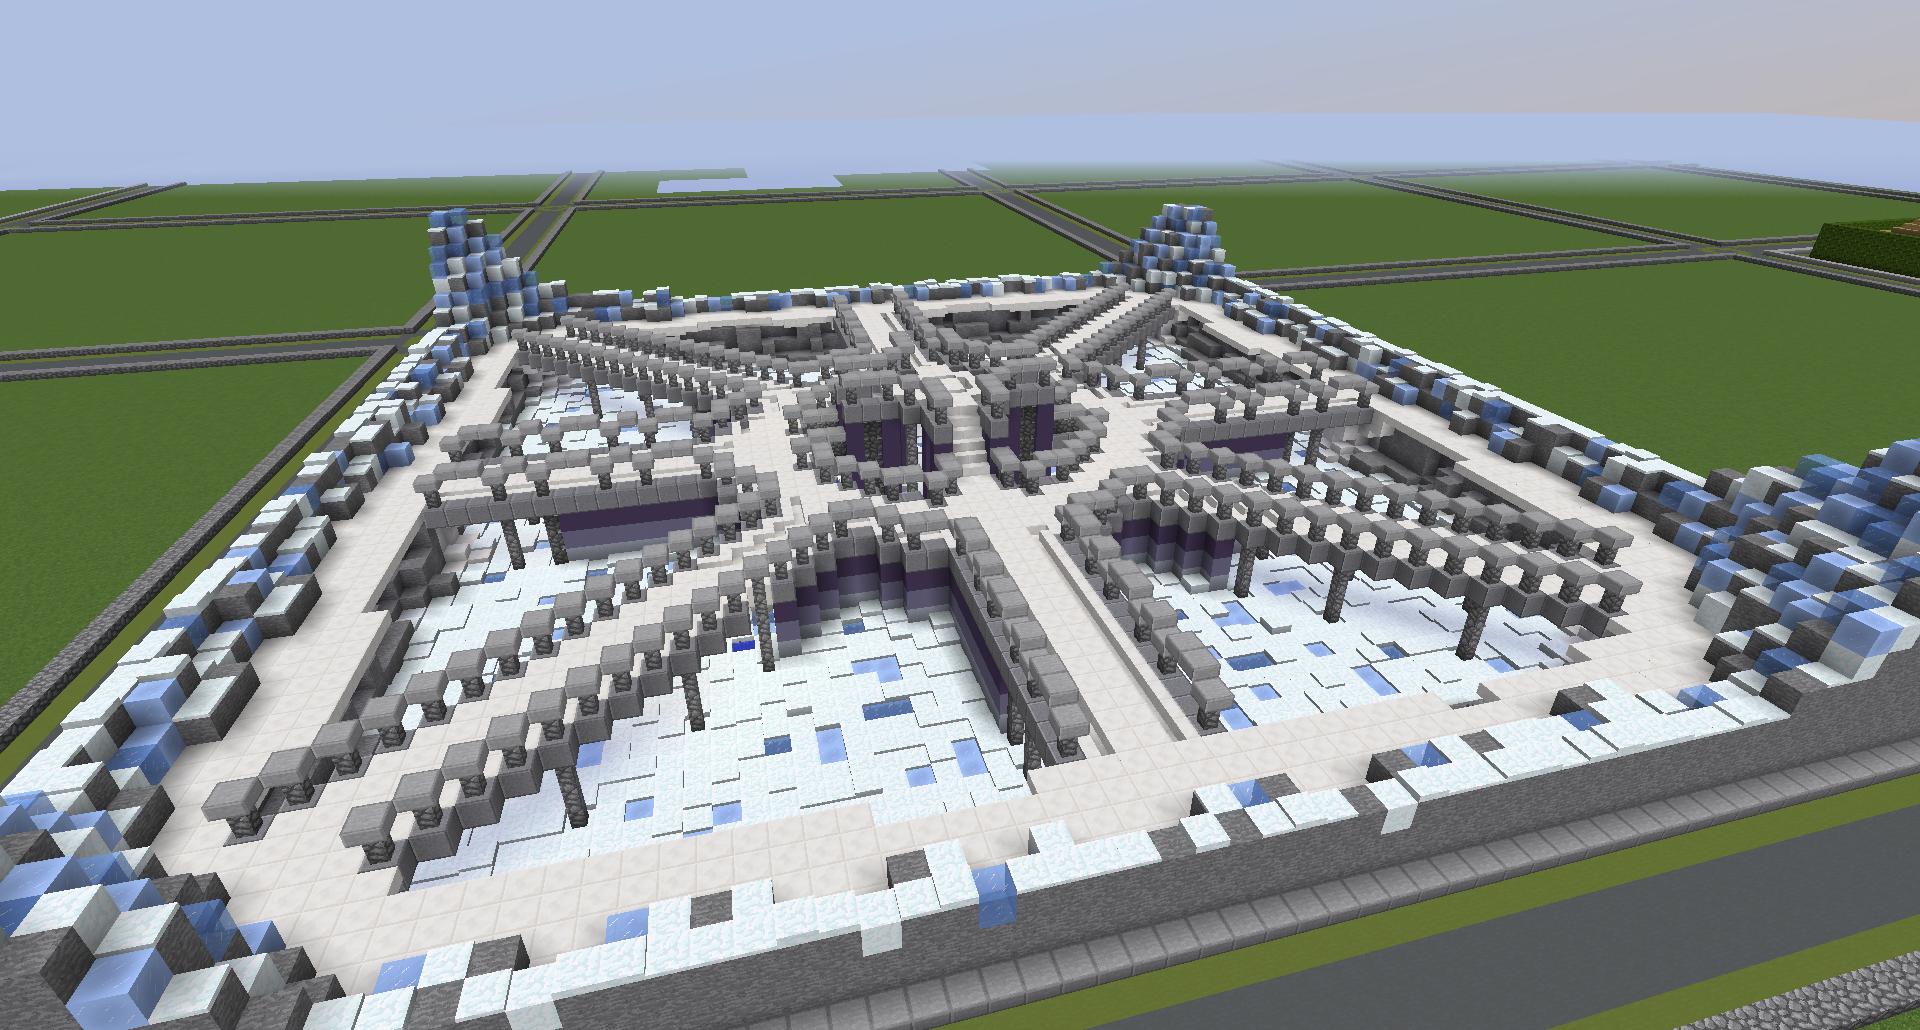 minecraft #building #builds #fantasy #hub #lobby